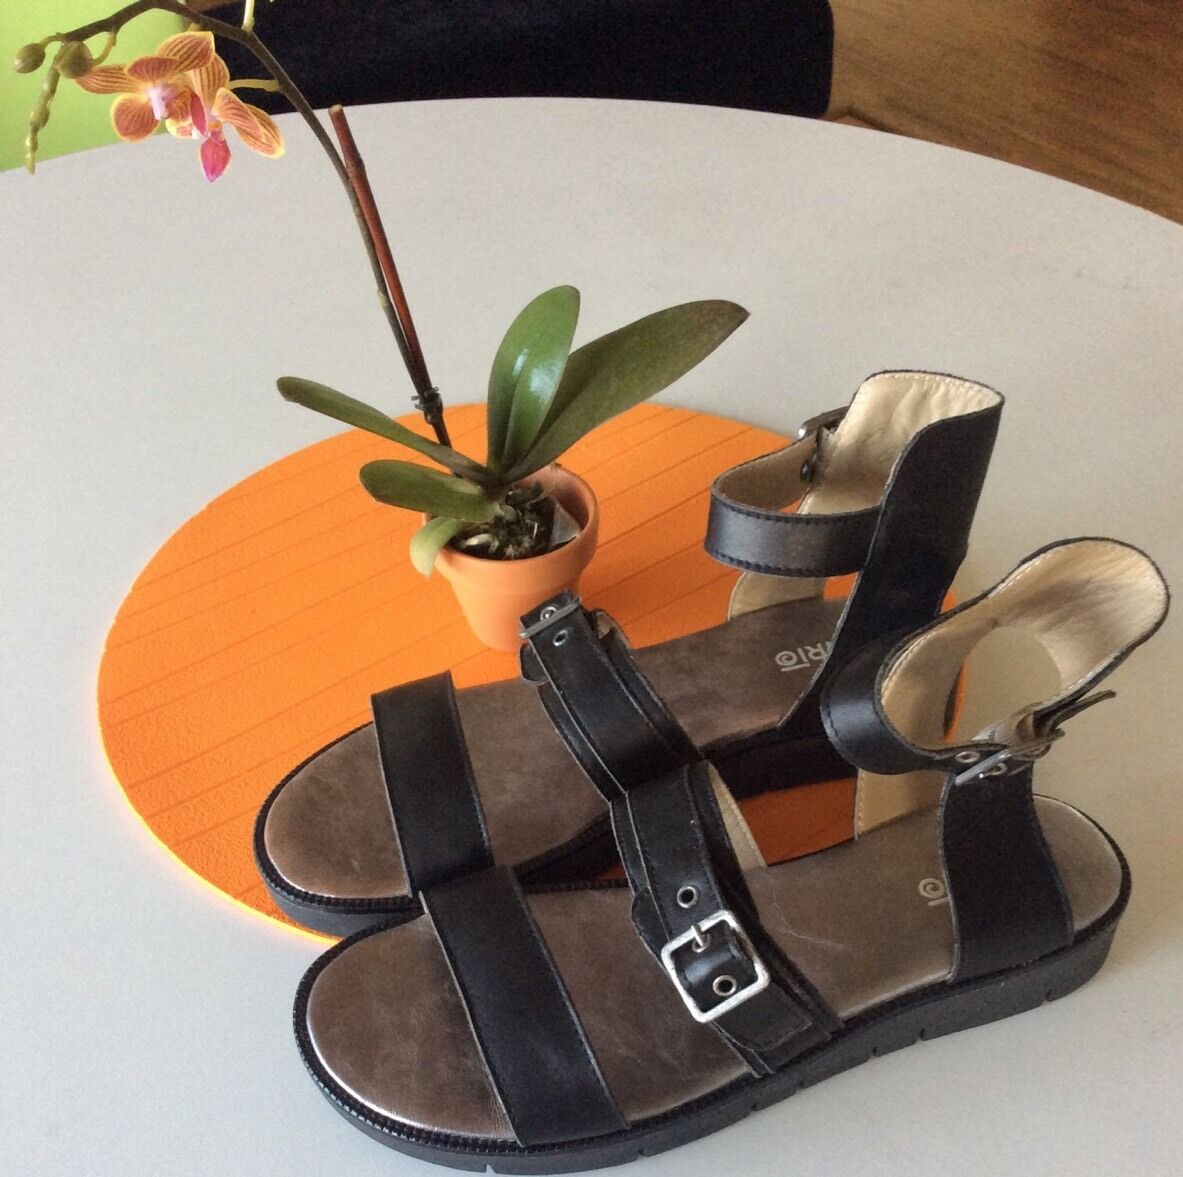 245 NWOB- KHRIO Fast Buckle Platform SANDALS Leather Ankle Strap EU 41 US 9.5